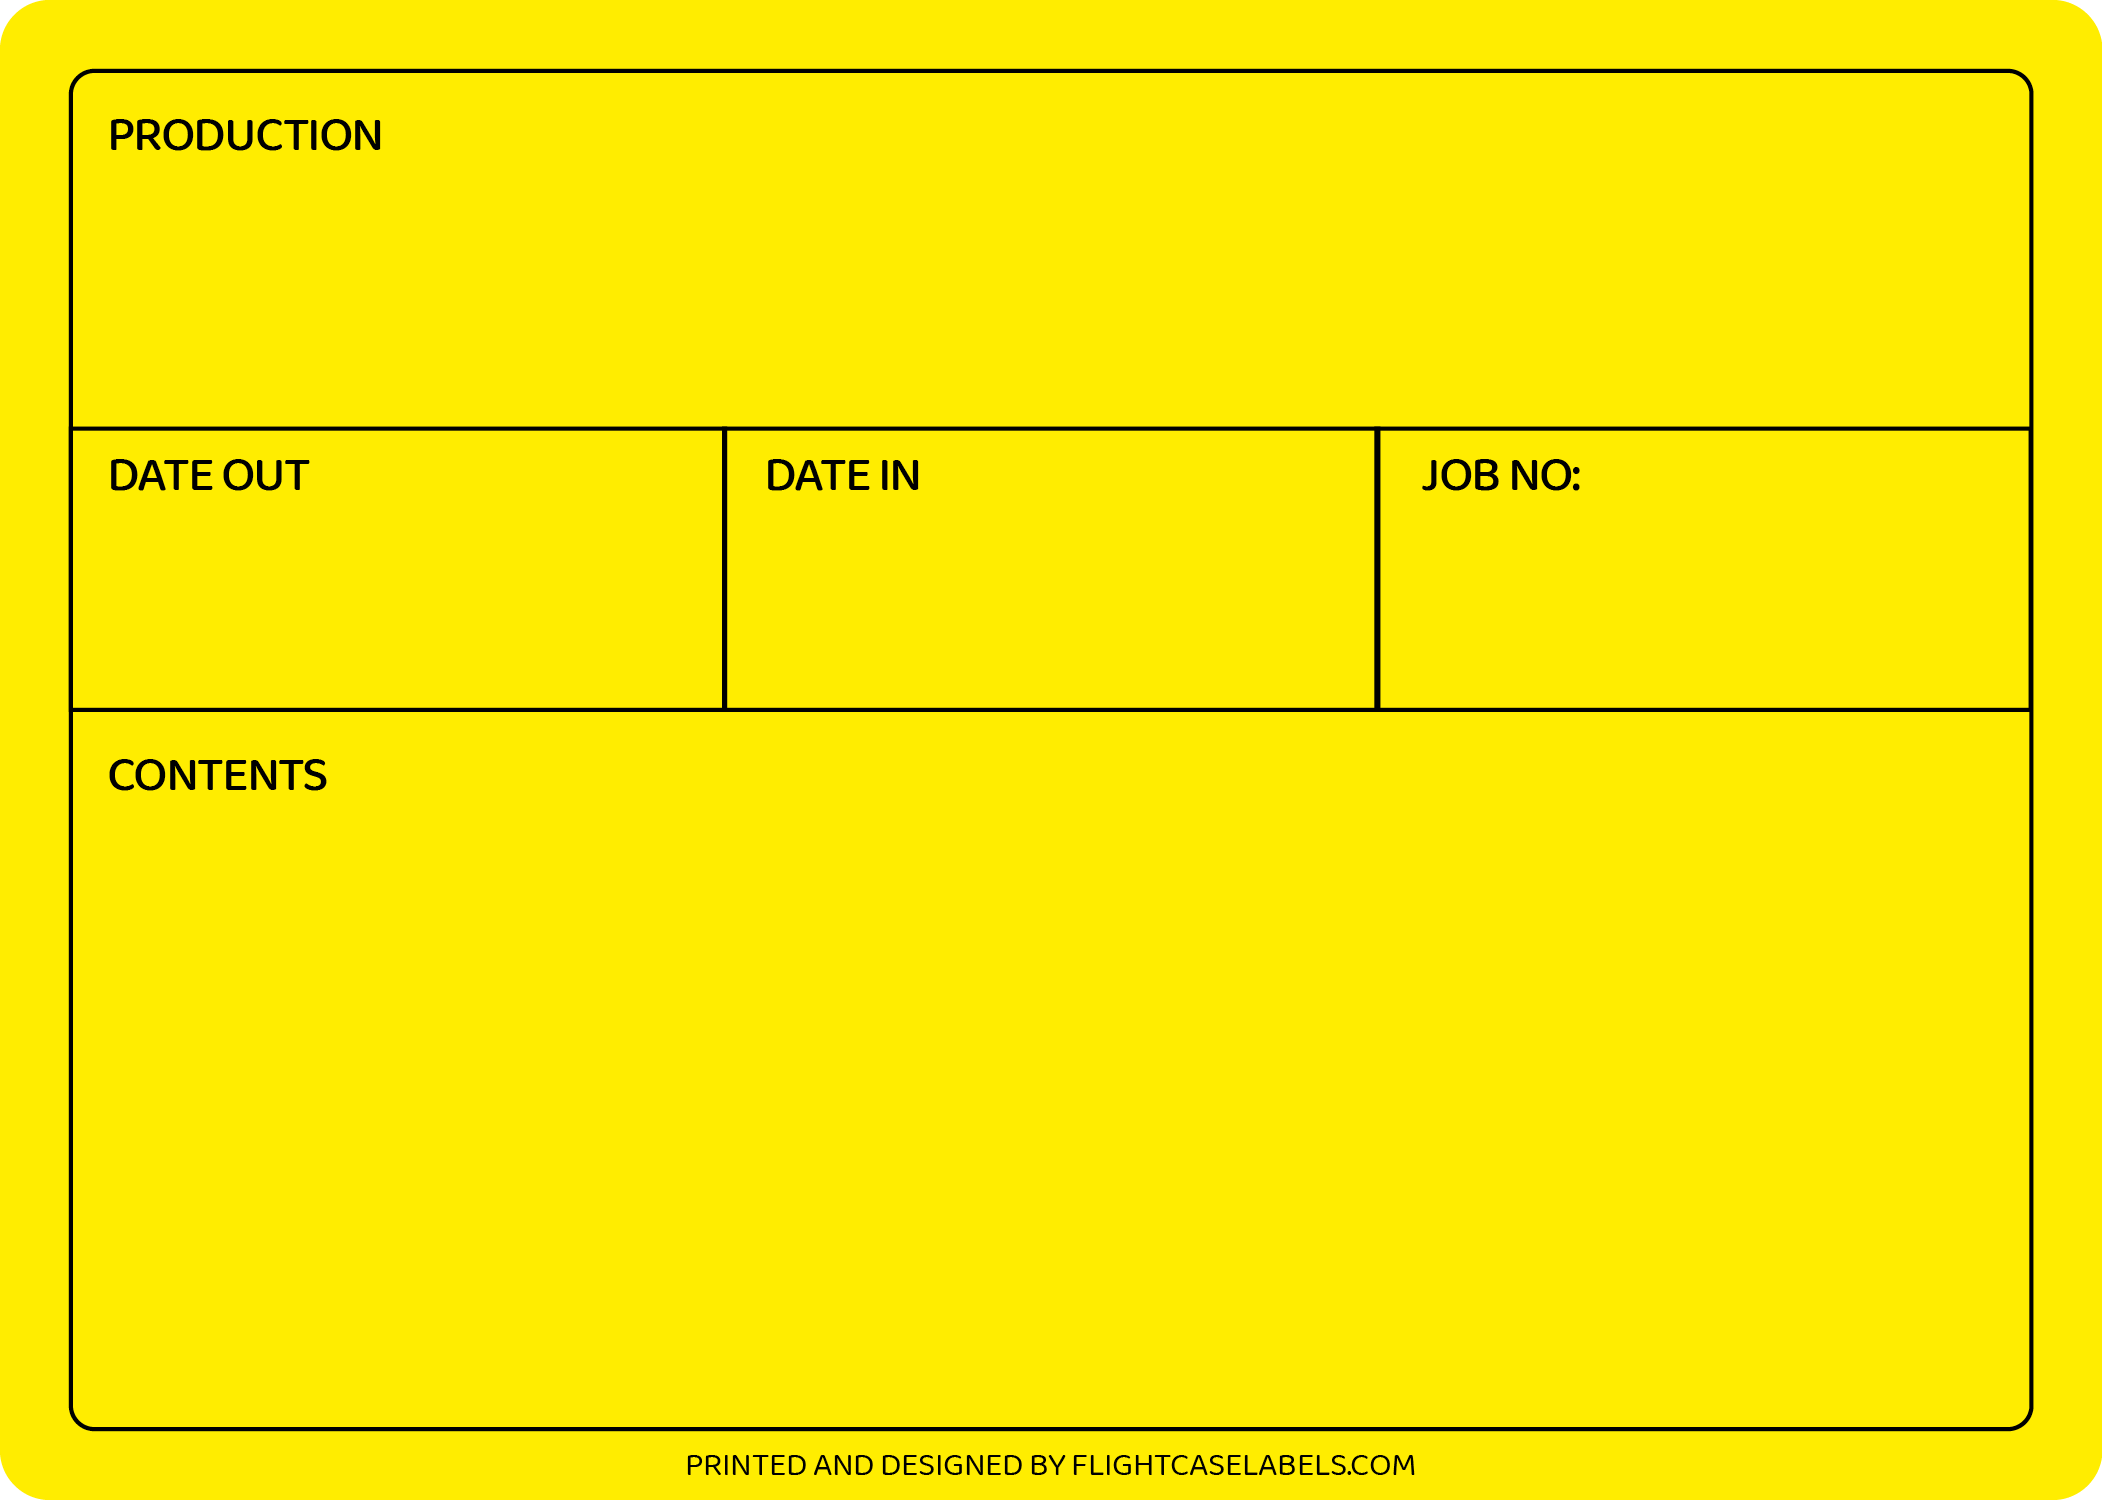 A bright yellow flight case label